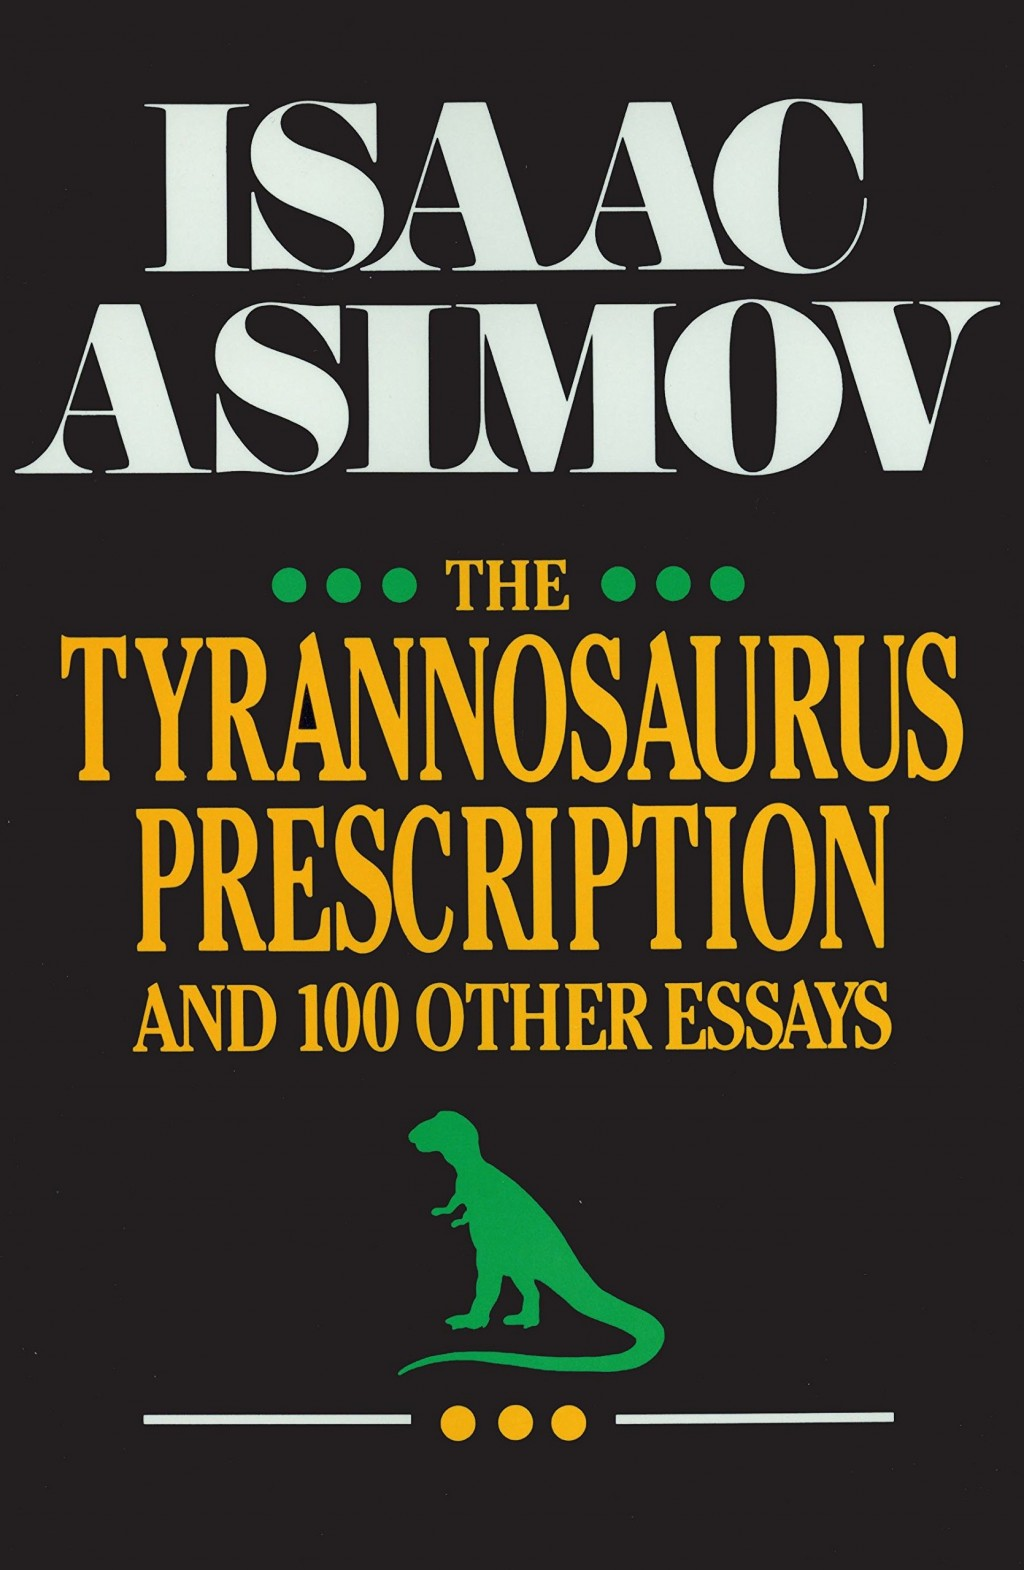 006 Essay Example Isaac Asimov Essays Awful On Creativity Intelligence Large